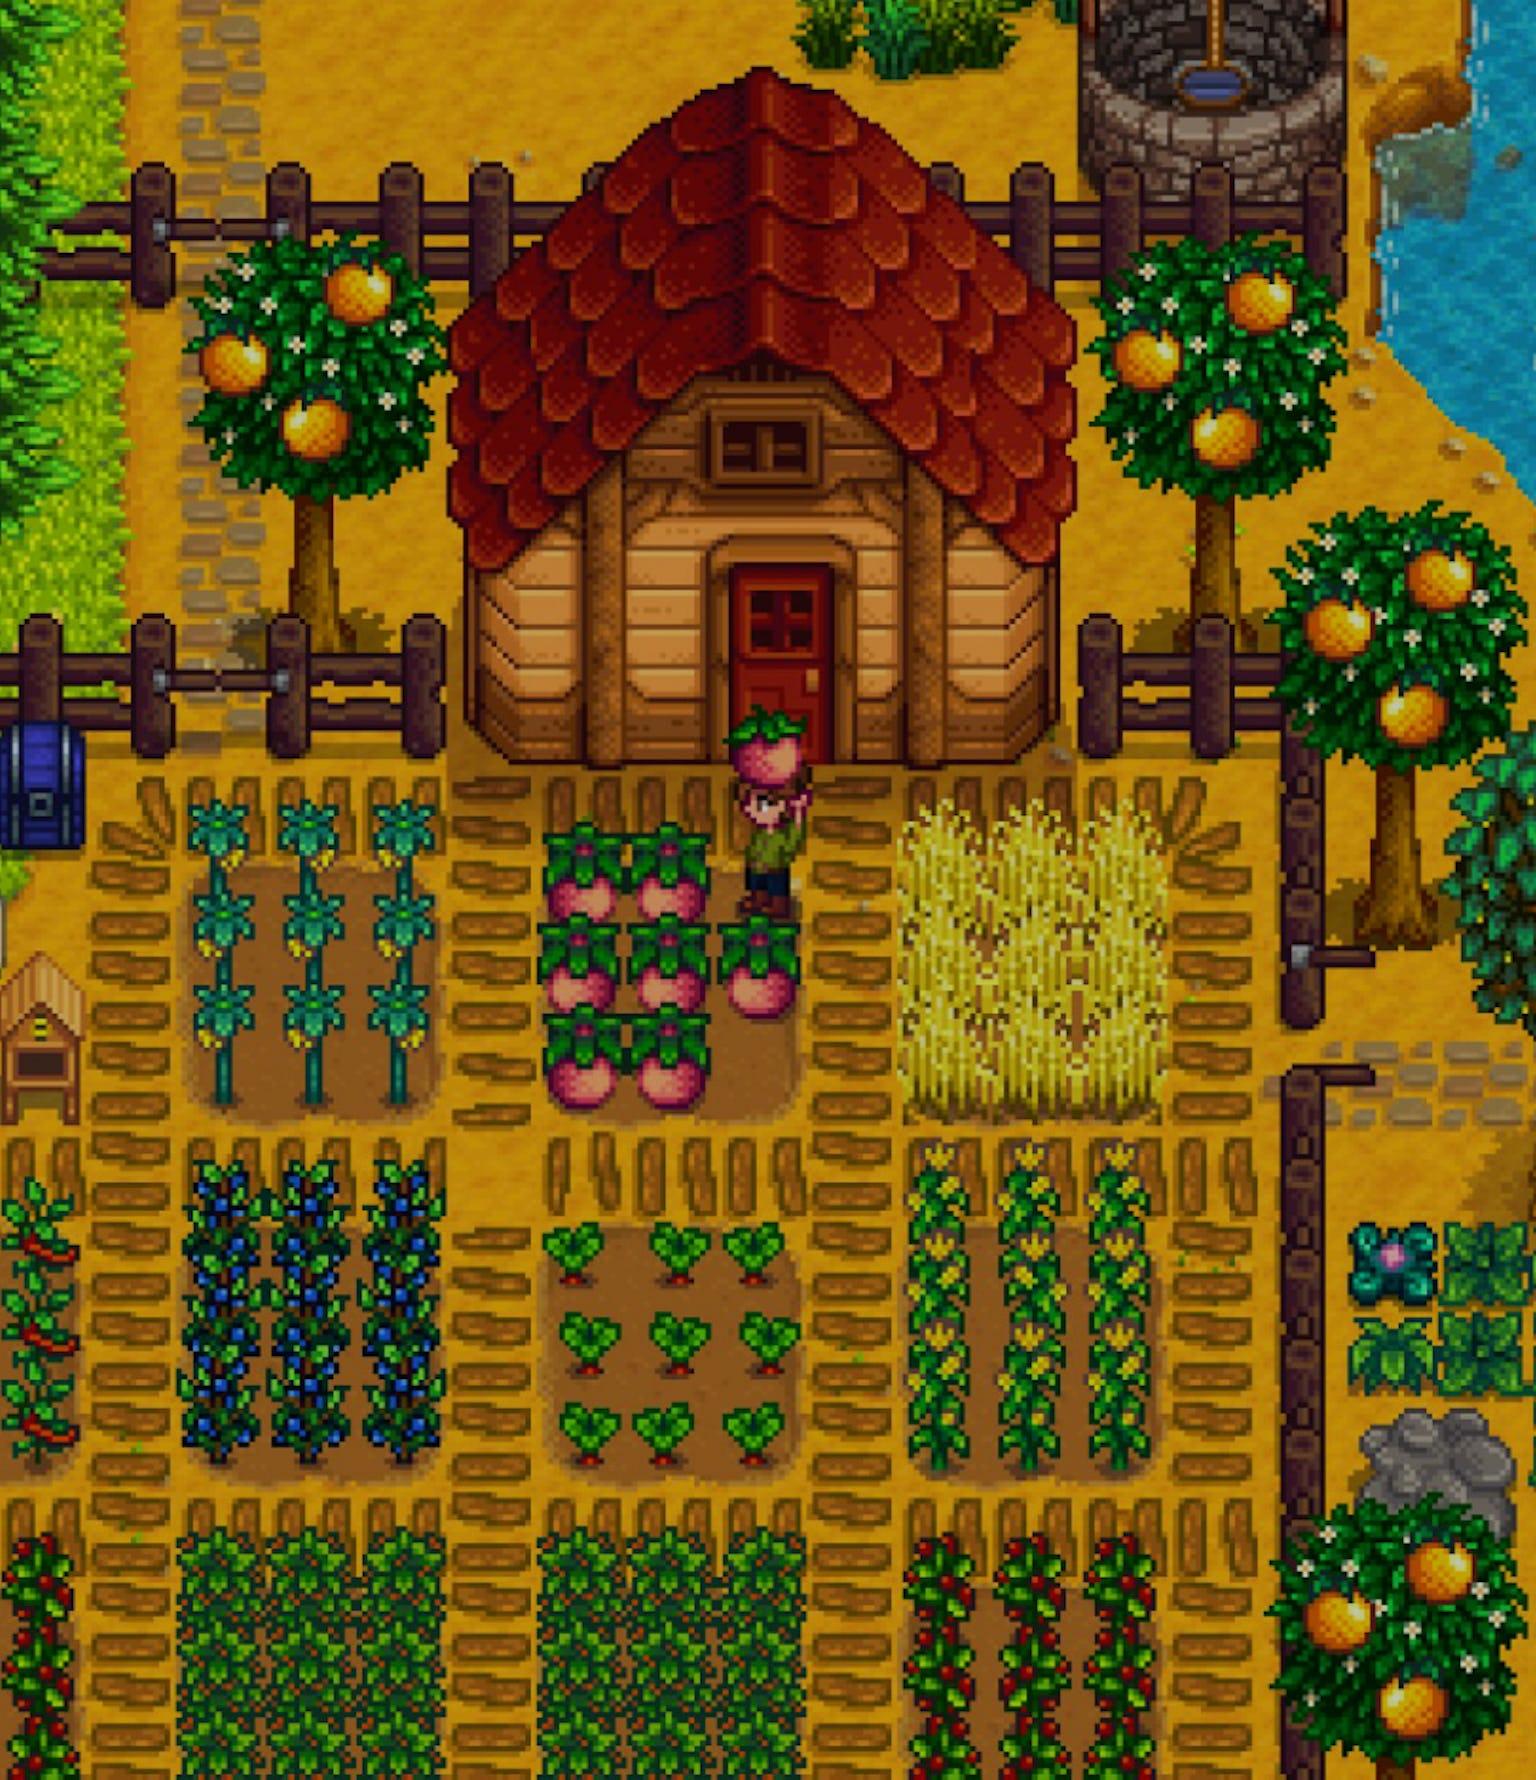 Stardew Valley Massively Updated with Version 1.1   USgamer